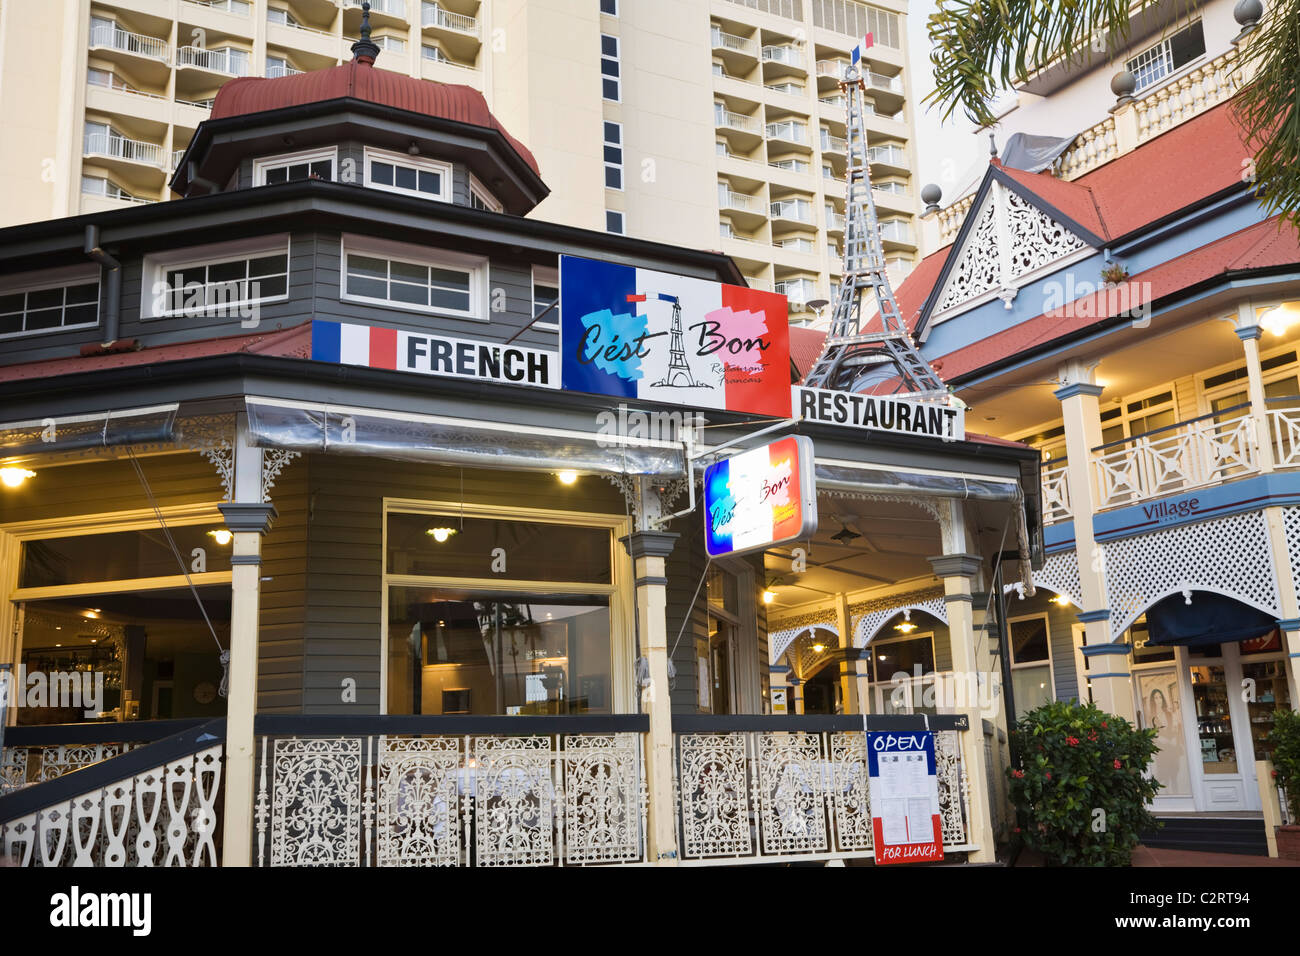 Restaurant C Est Bon  Ef Bf Bd Cairns Australia